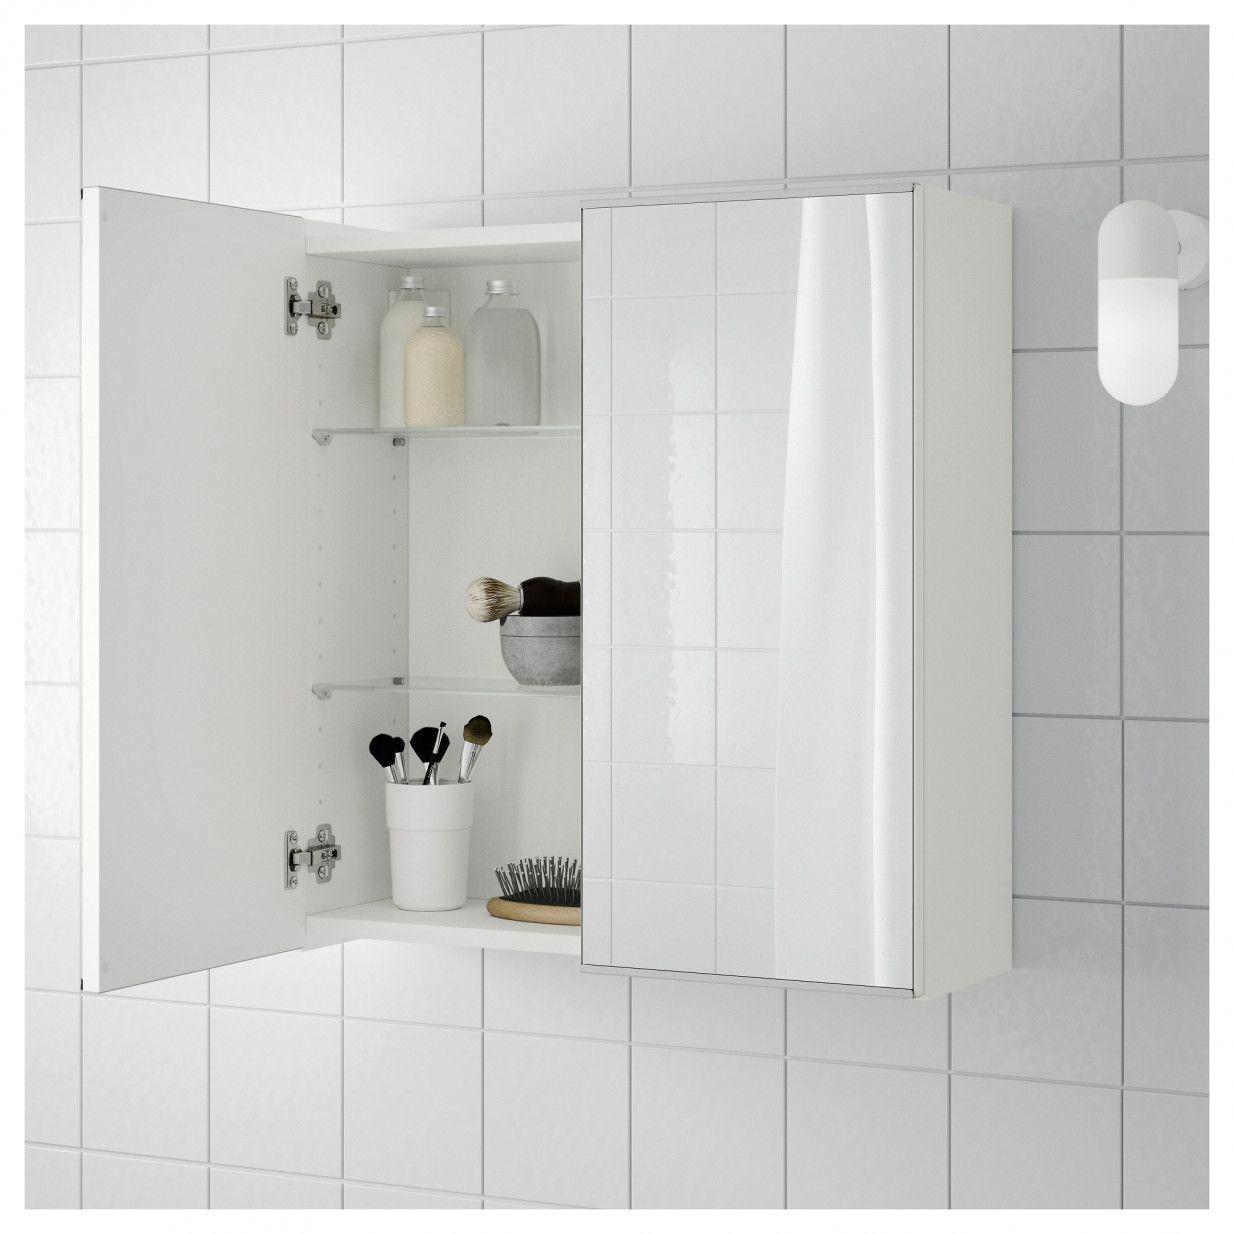 2019 Ikea Bathroom Mirror Cabinet - Interior Paint Colors 2017 Check ...